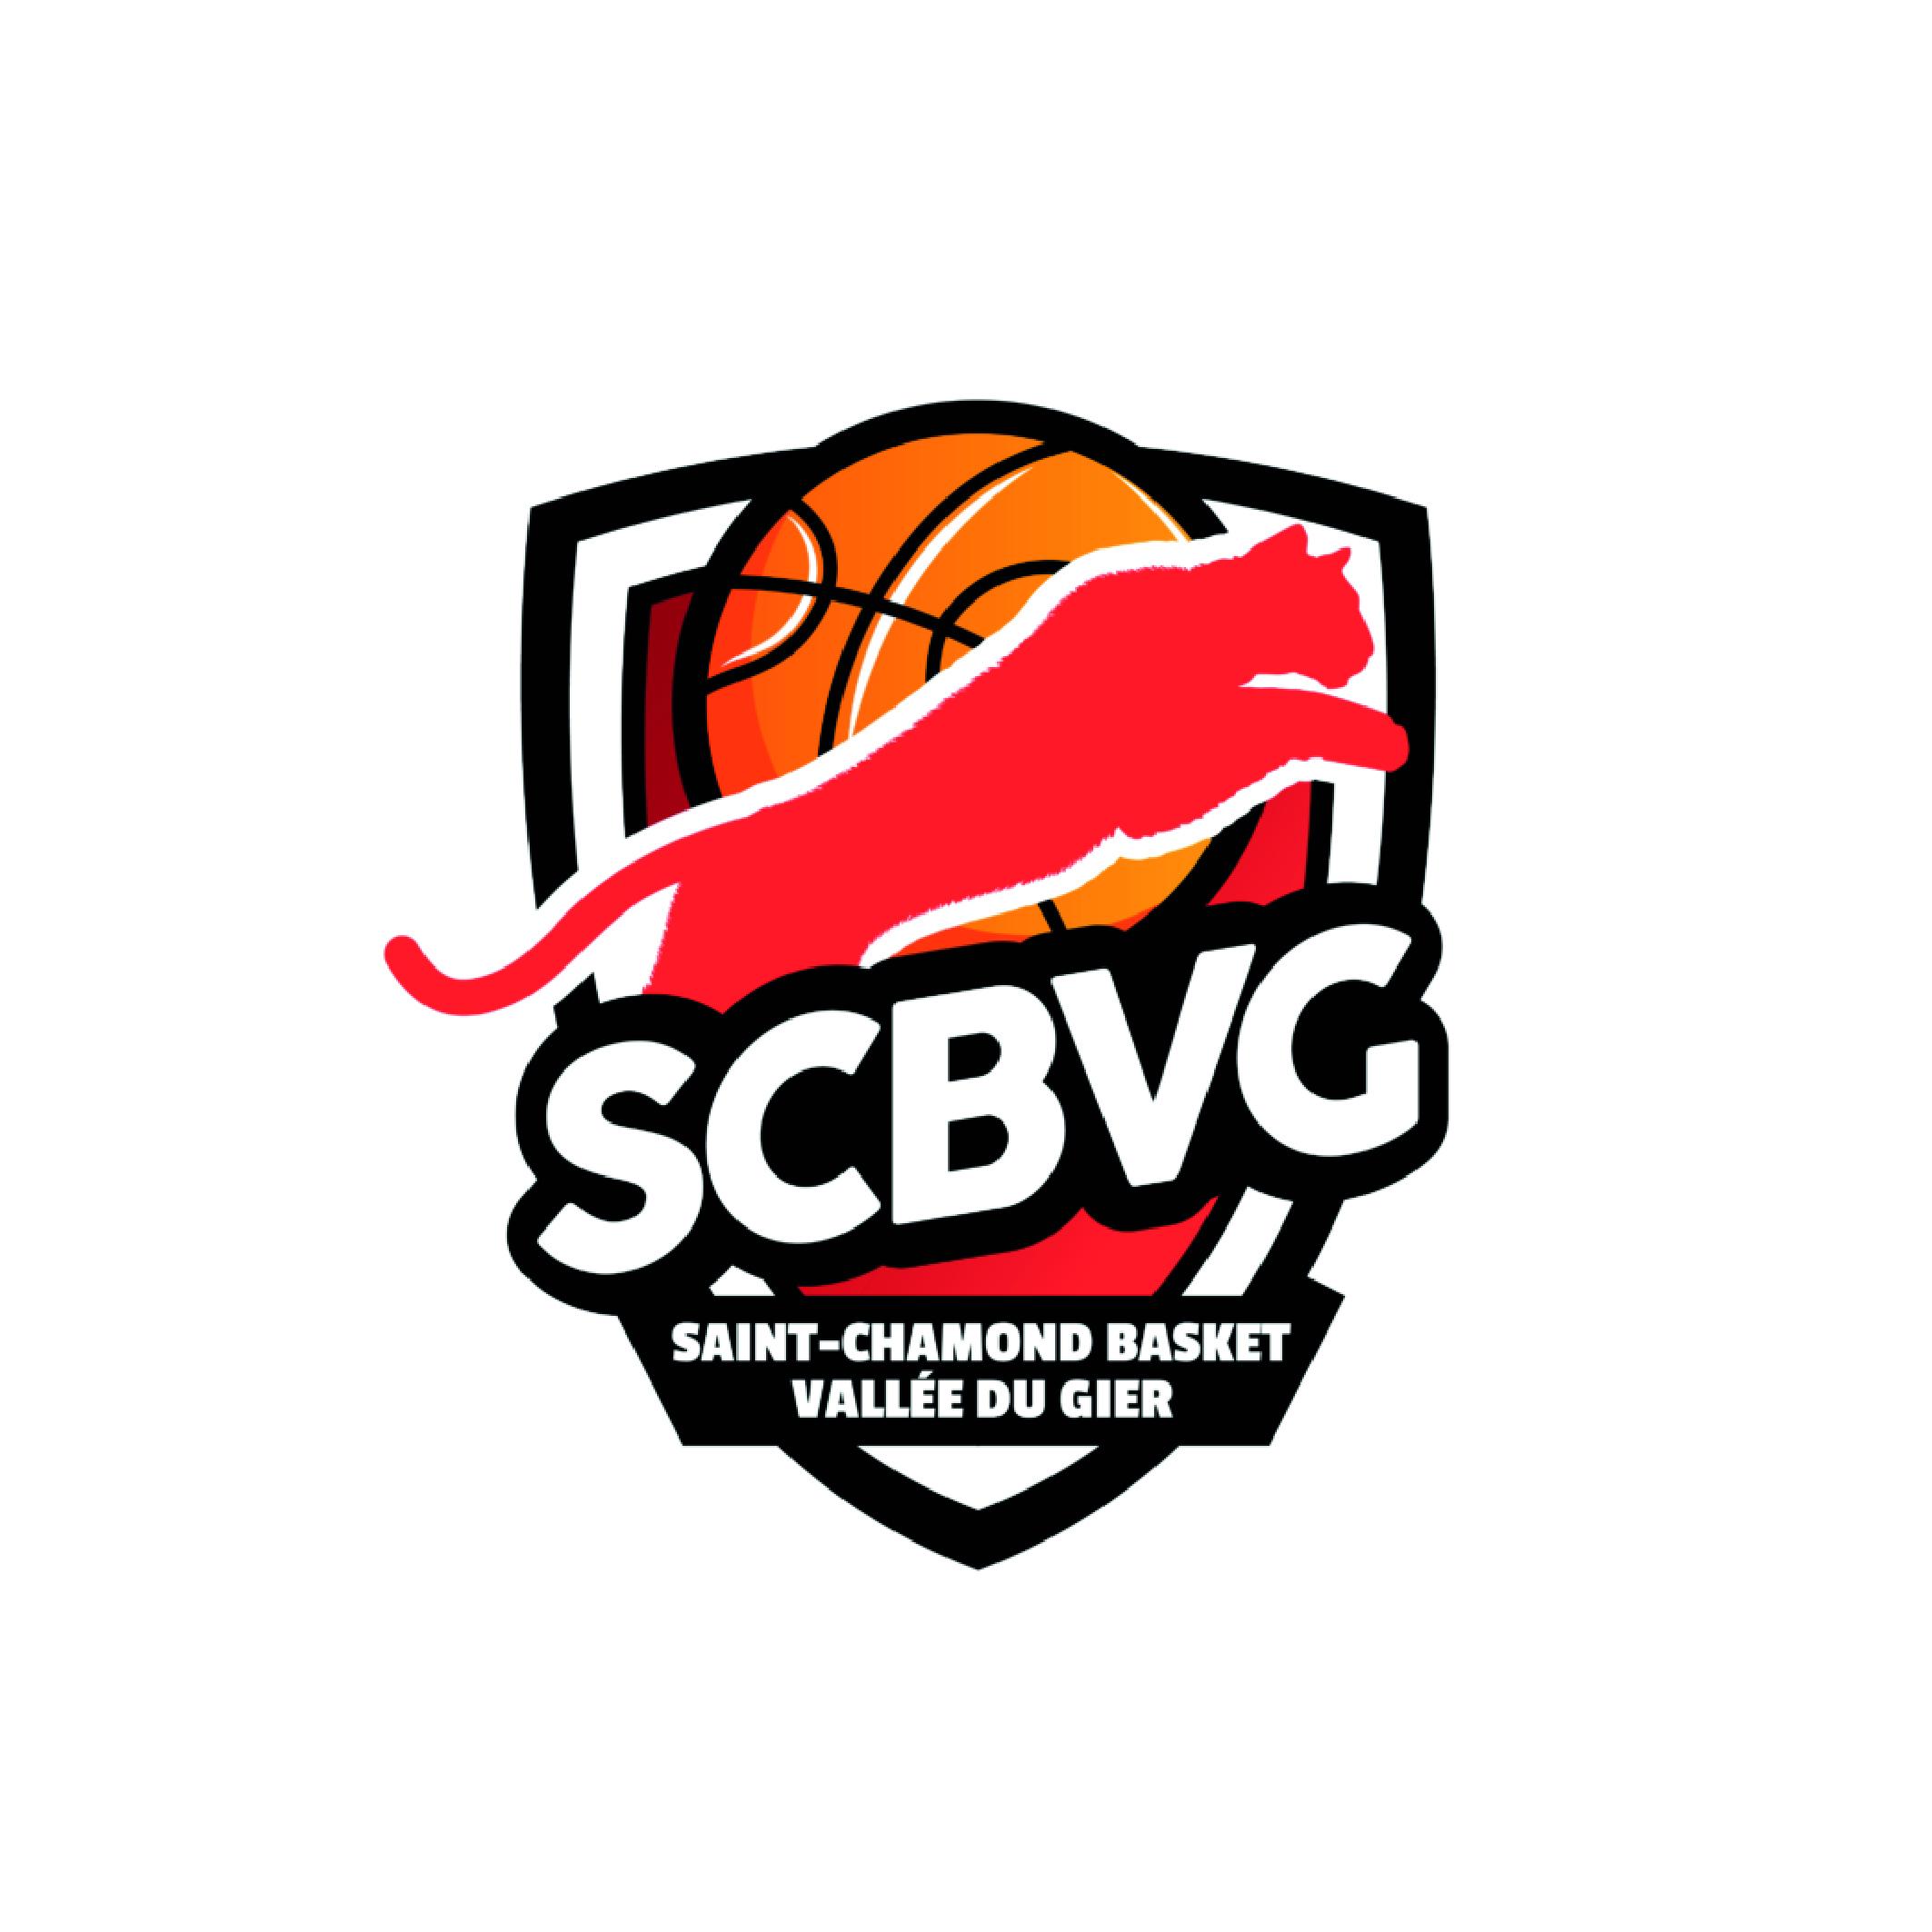 Recruteur Emploi sport - Saint-Chamond Basket